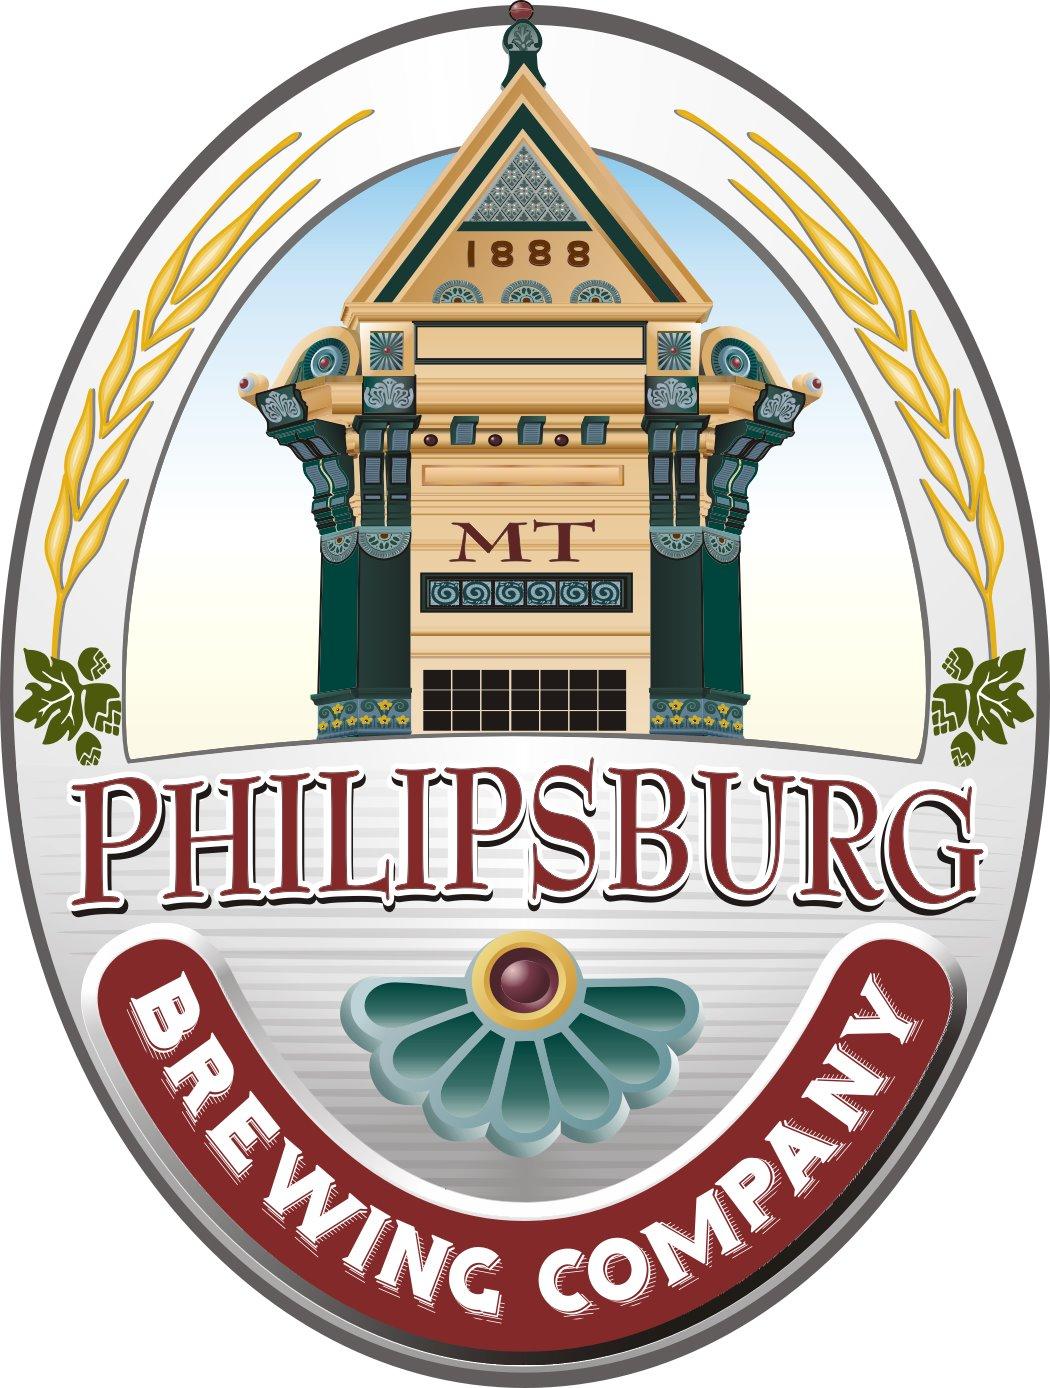 Philipsburg Brewing